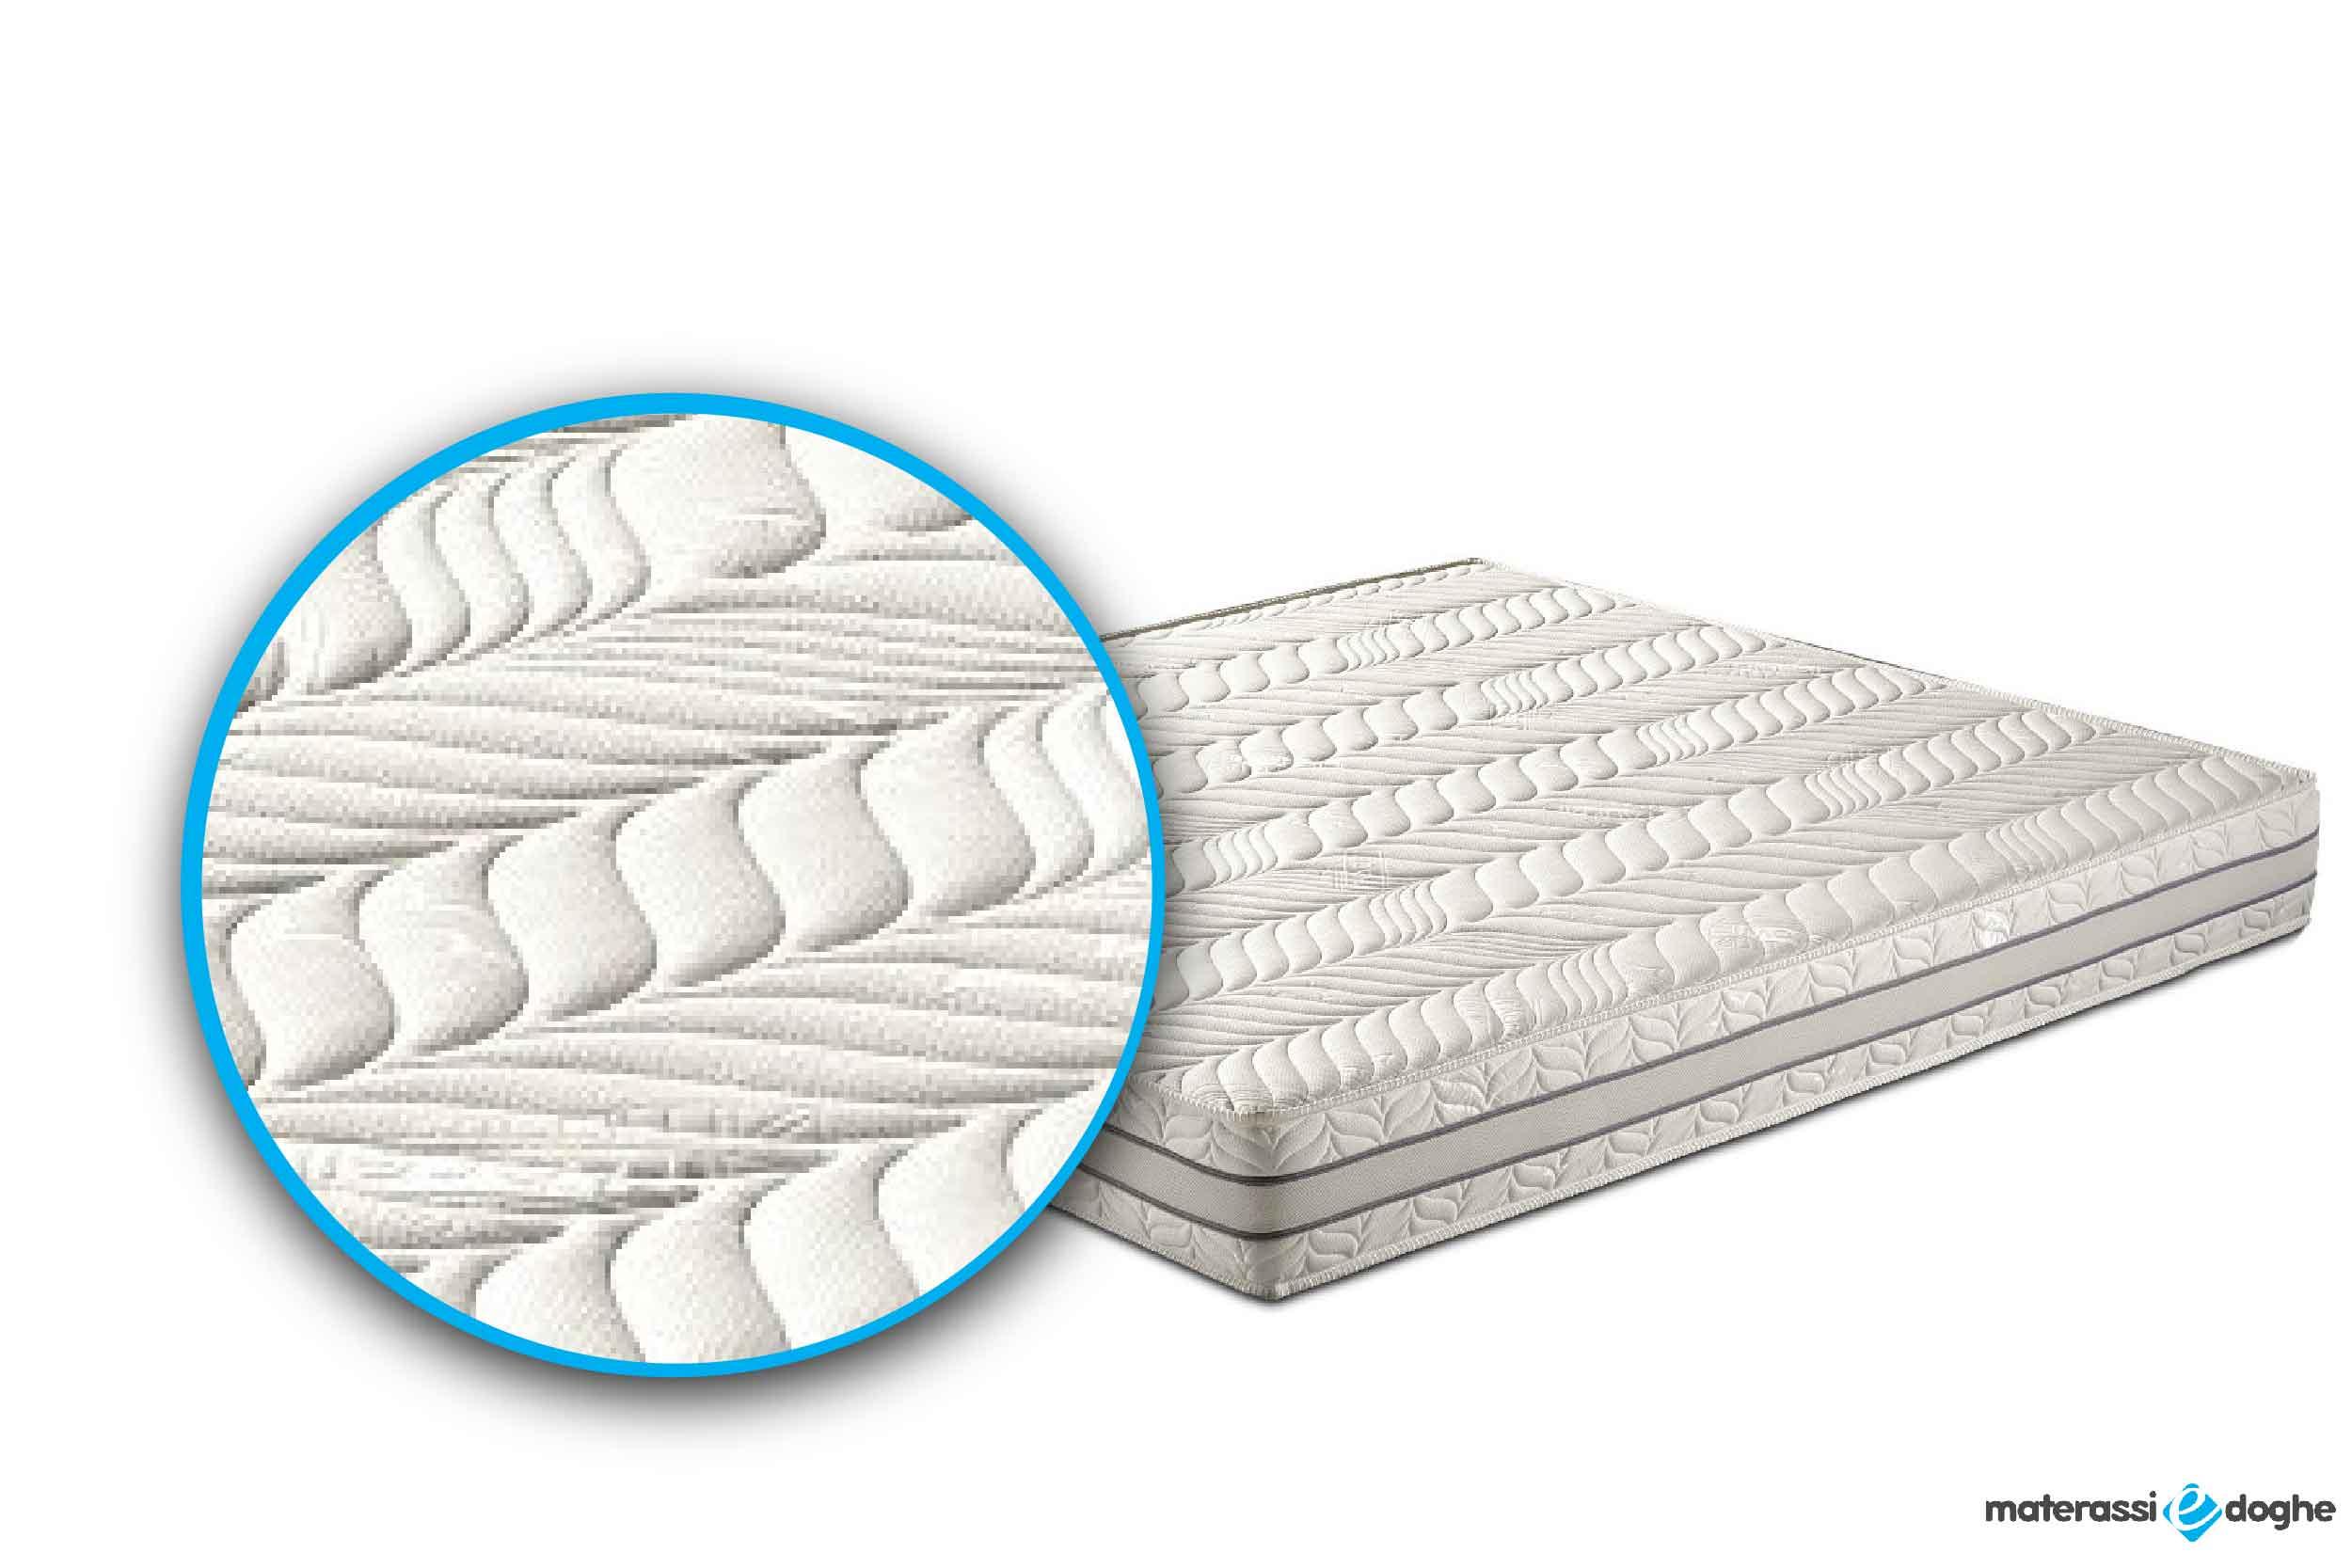 Memory Foam Mymemory Mattress Luxury With 5 Layers And Anti Stress Copper Fiber Materassi E Doghe